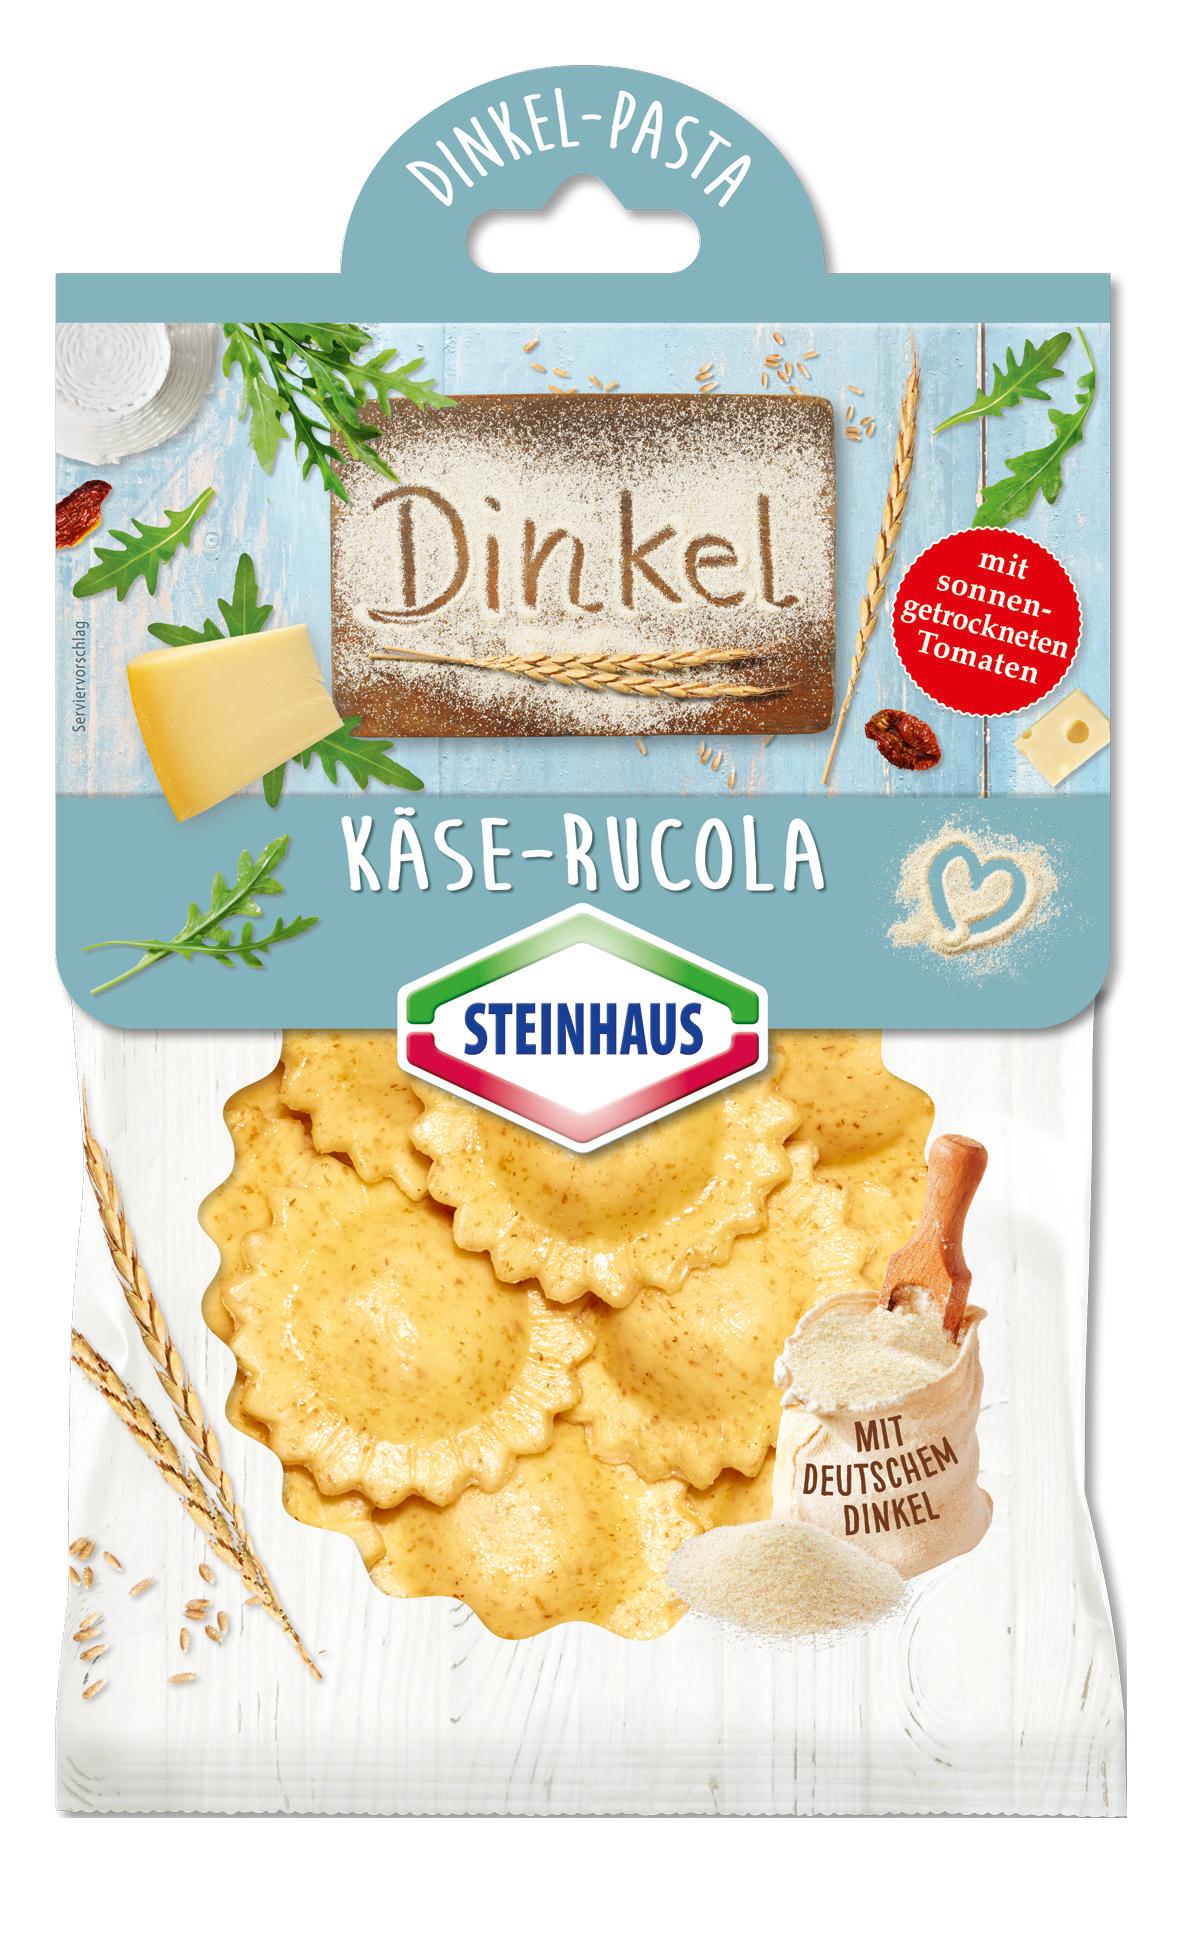 Dinkel-Pasta Käse Rucola mit sonnengetrockneten Tomaten